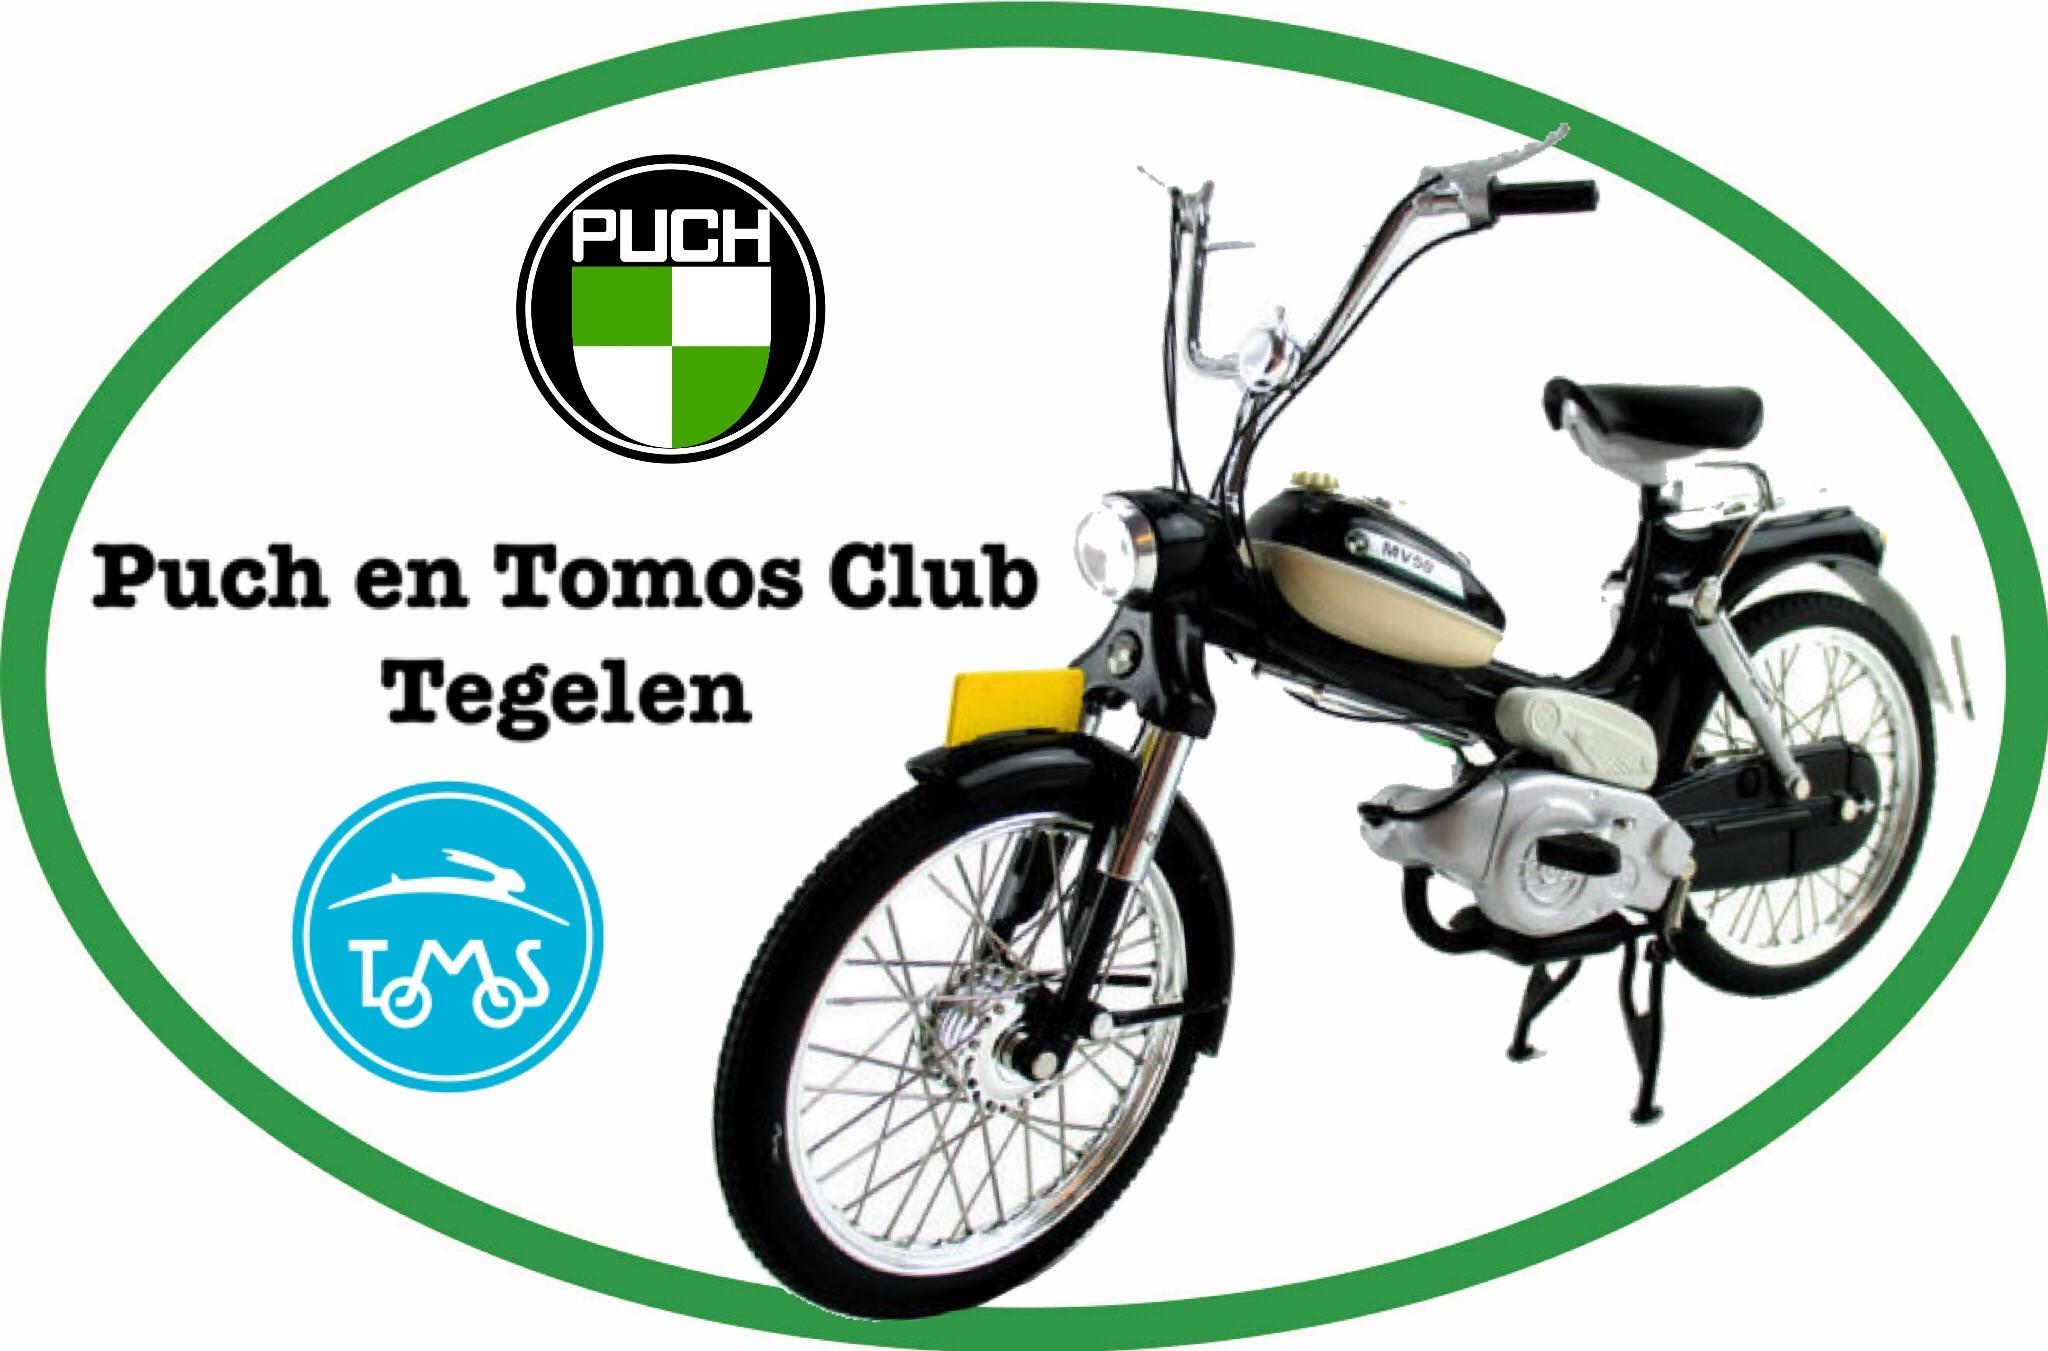 Toertocht Puch en Tomos Club Tegelen